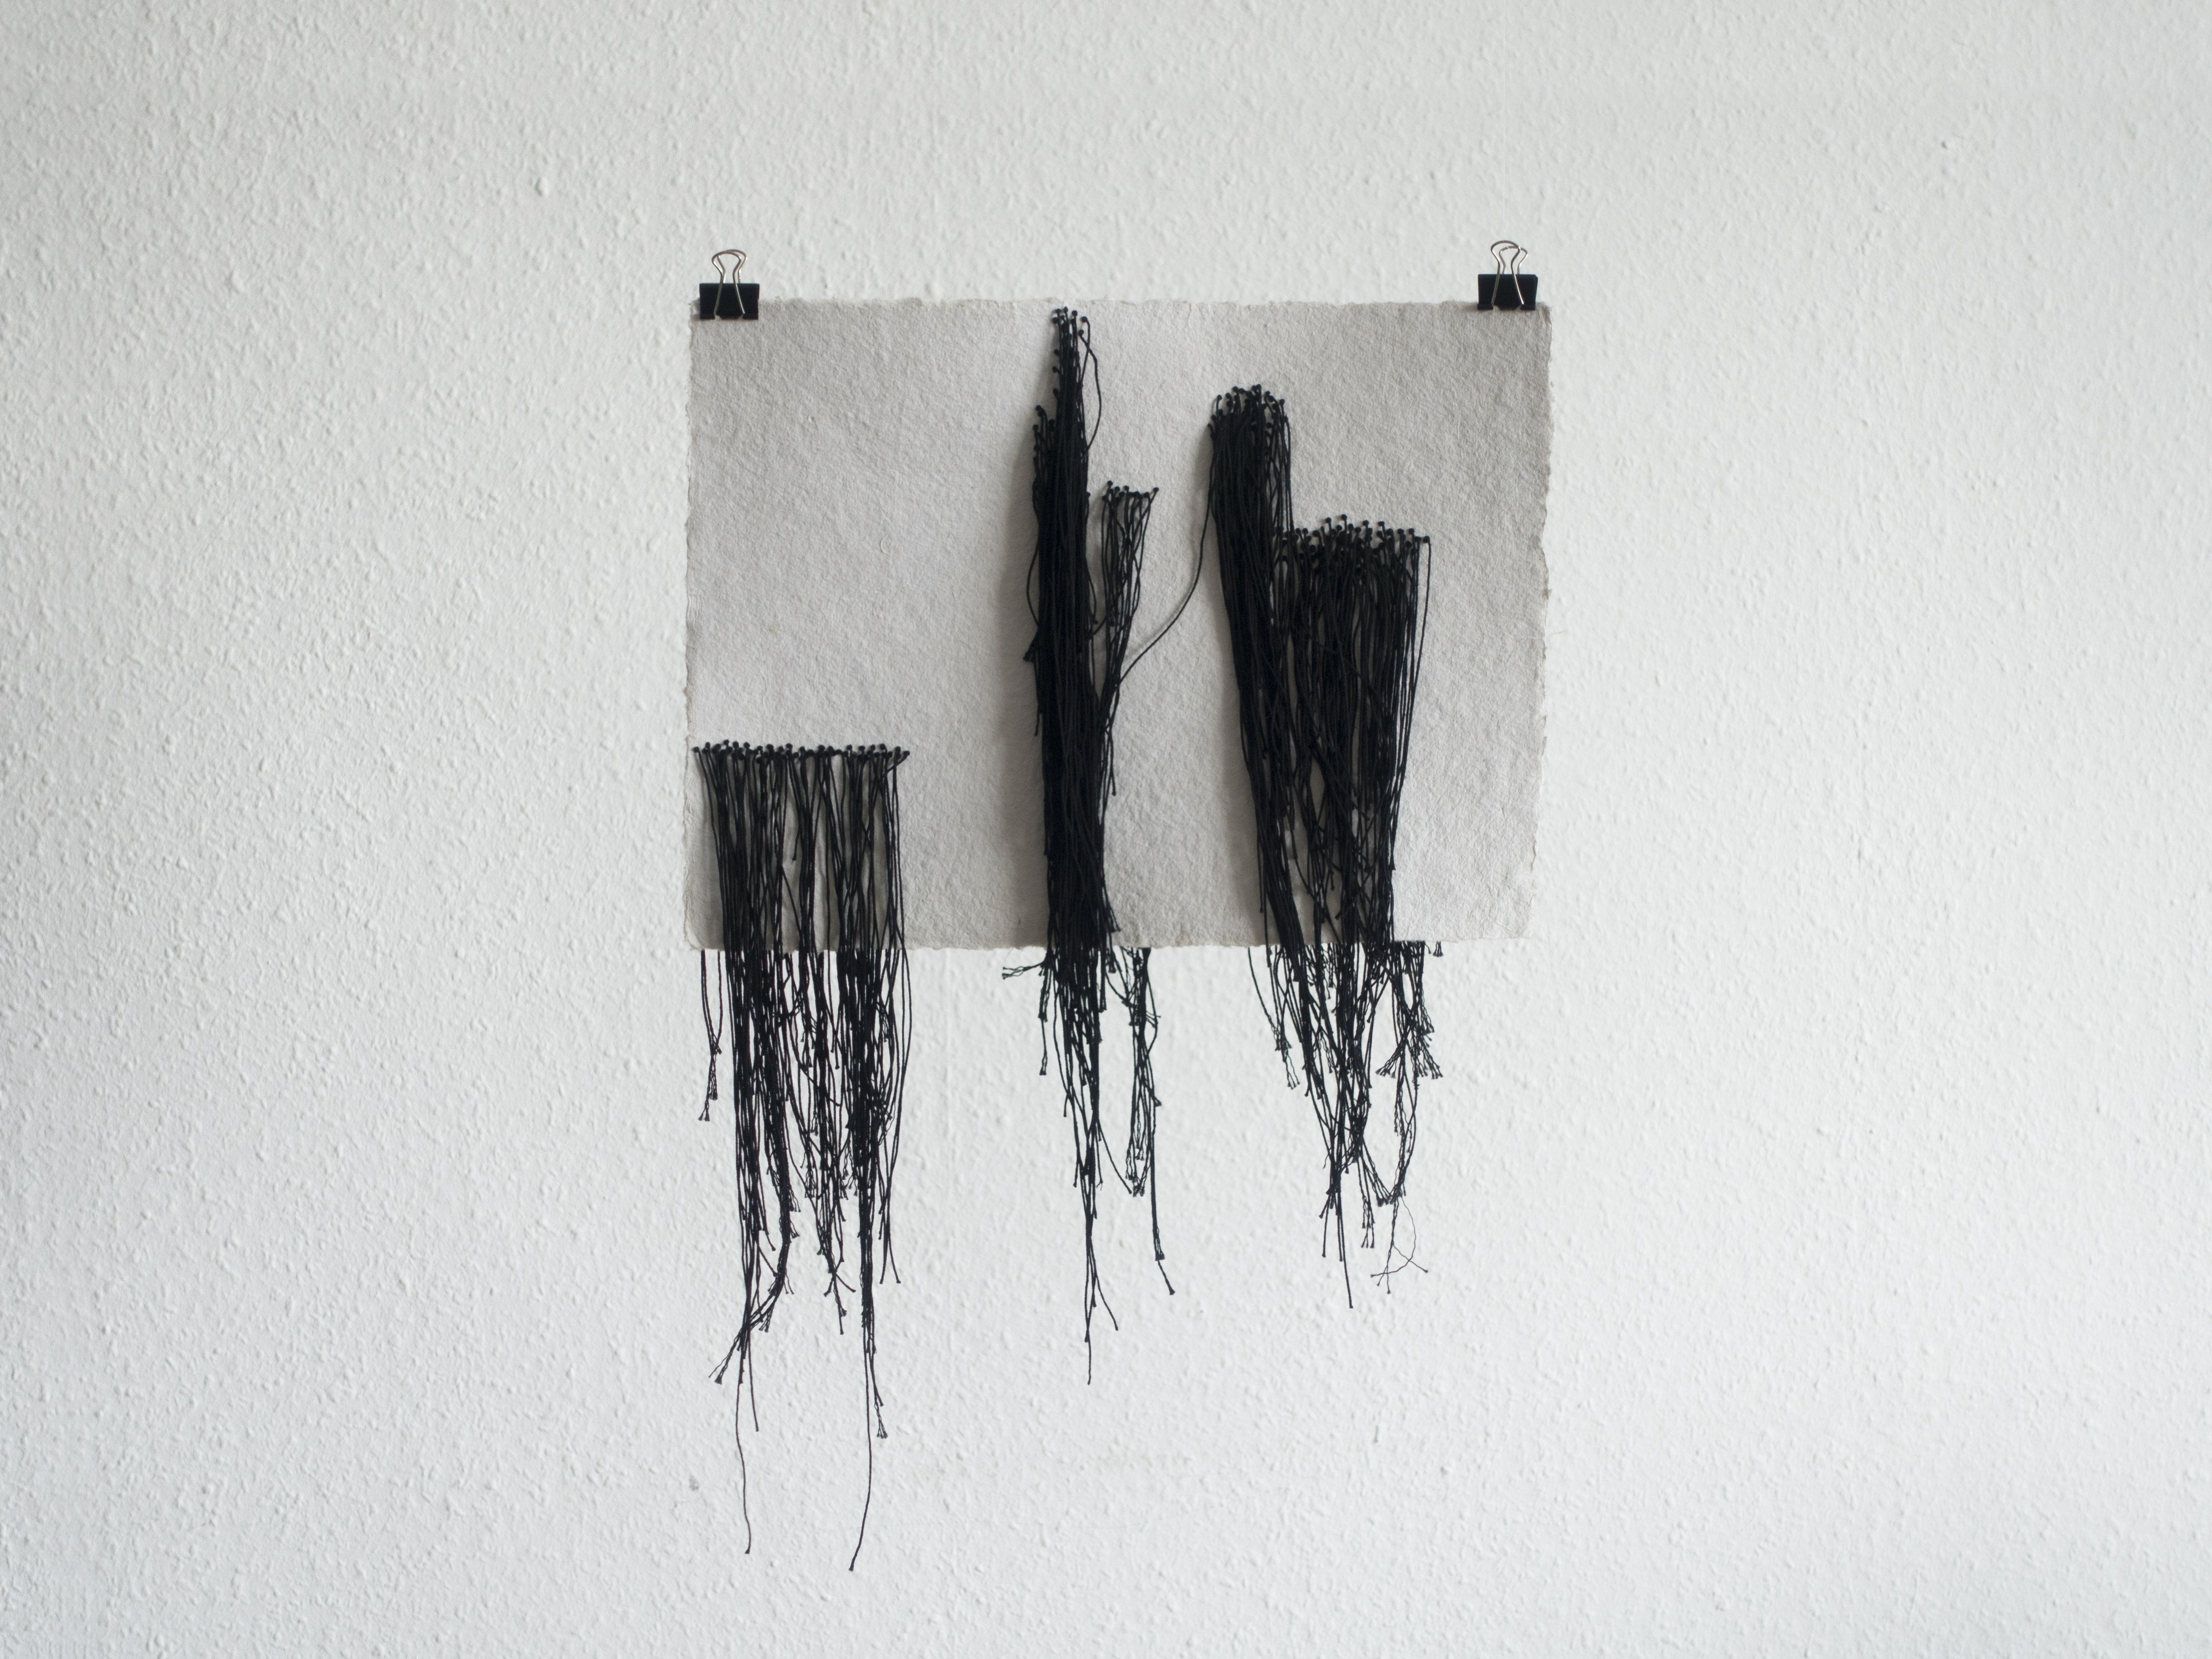 Isu Kim Installation Berlin Kreuzberg Sculpture Contemporary Art